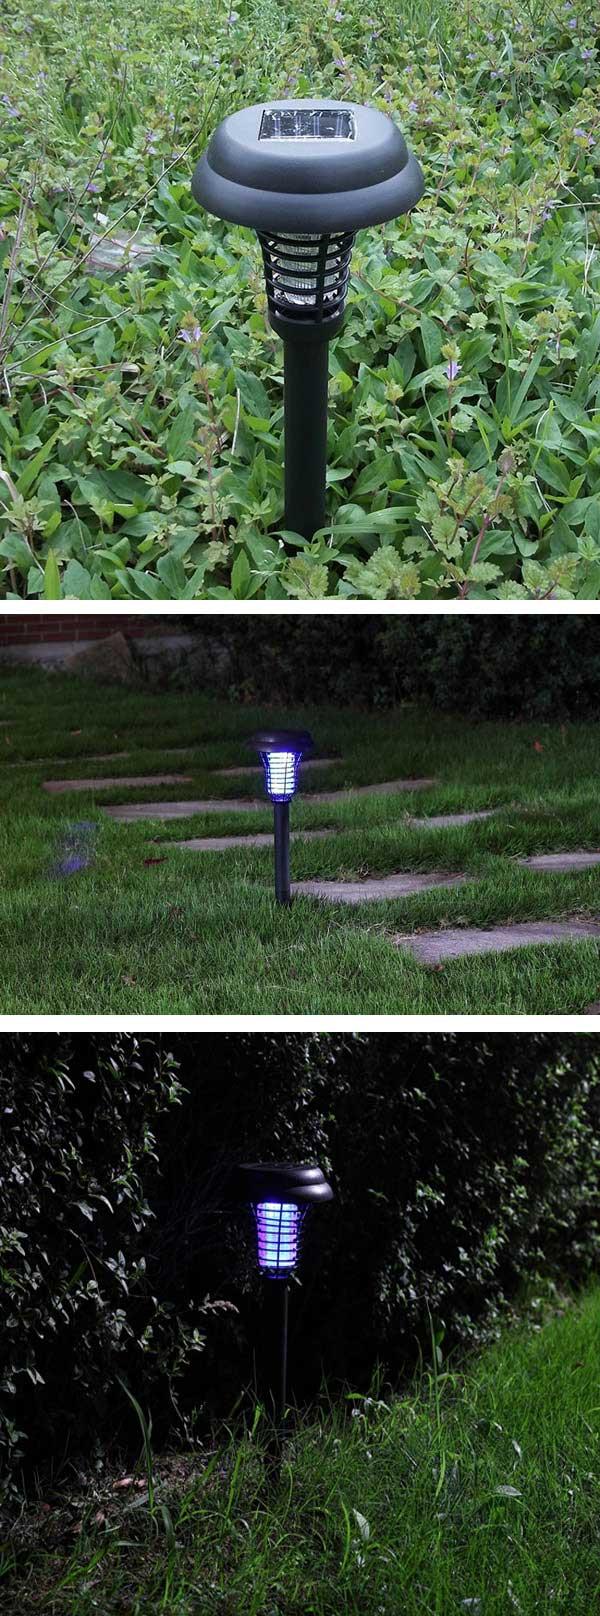 Garden Solar Power LED Mosquito Killer Lamp Yard Plastic Waterproof Lawn Light